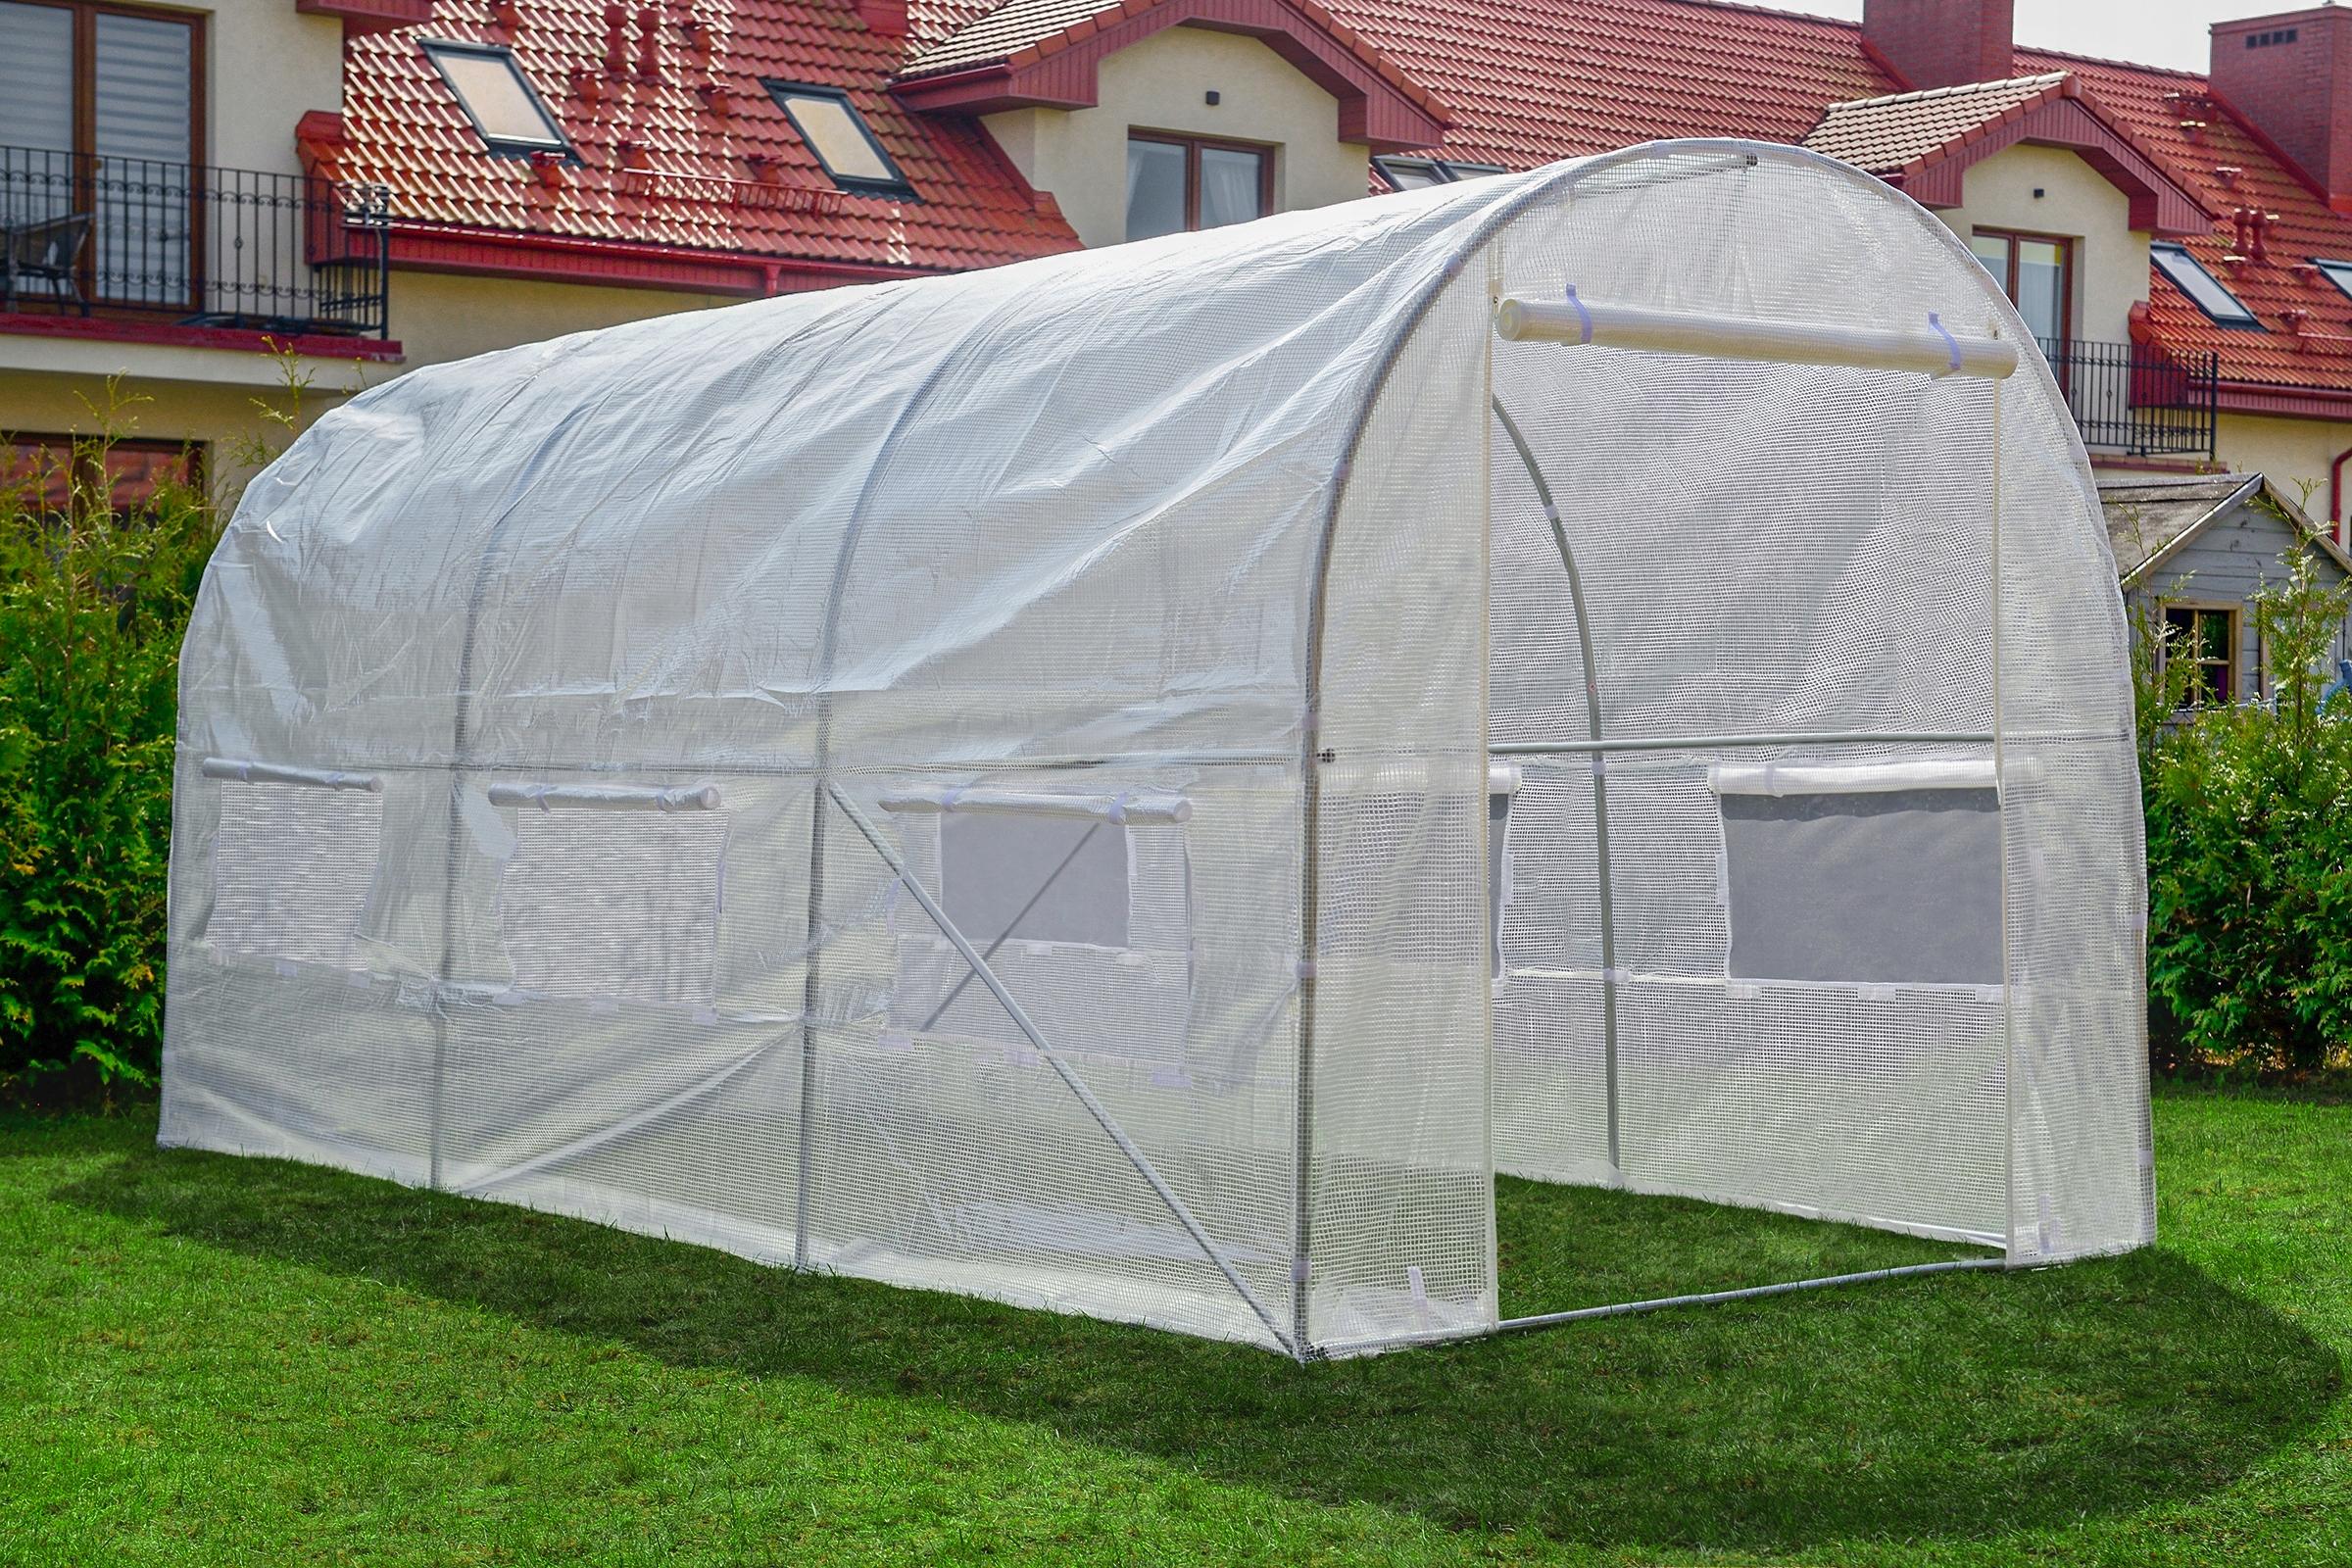 FÓLOVÝ TUNEL 6m2 ZAHRADA GREENHOUSE 3x2m UV-4 Výrobca Funfit Garden